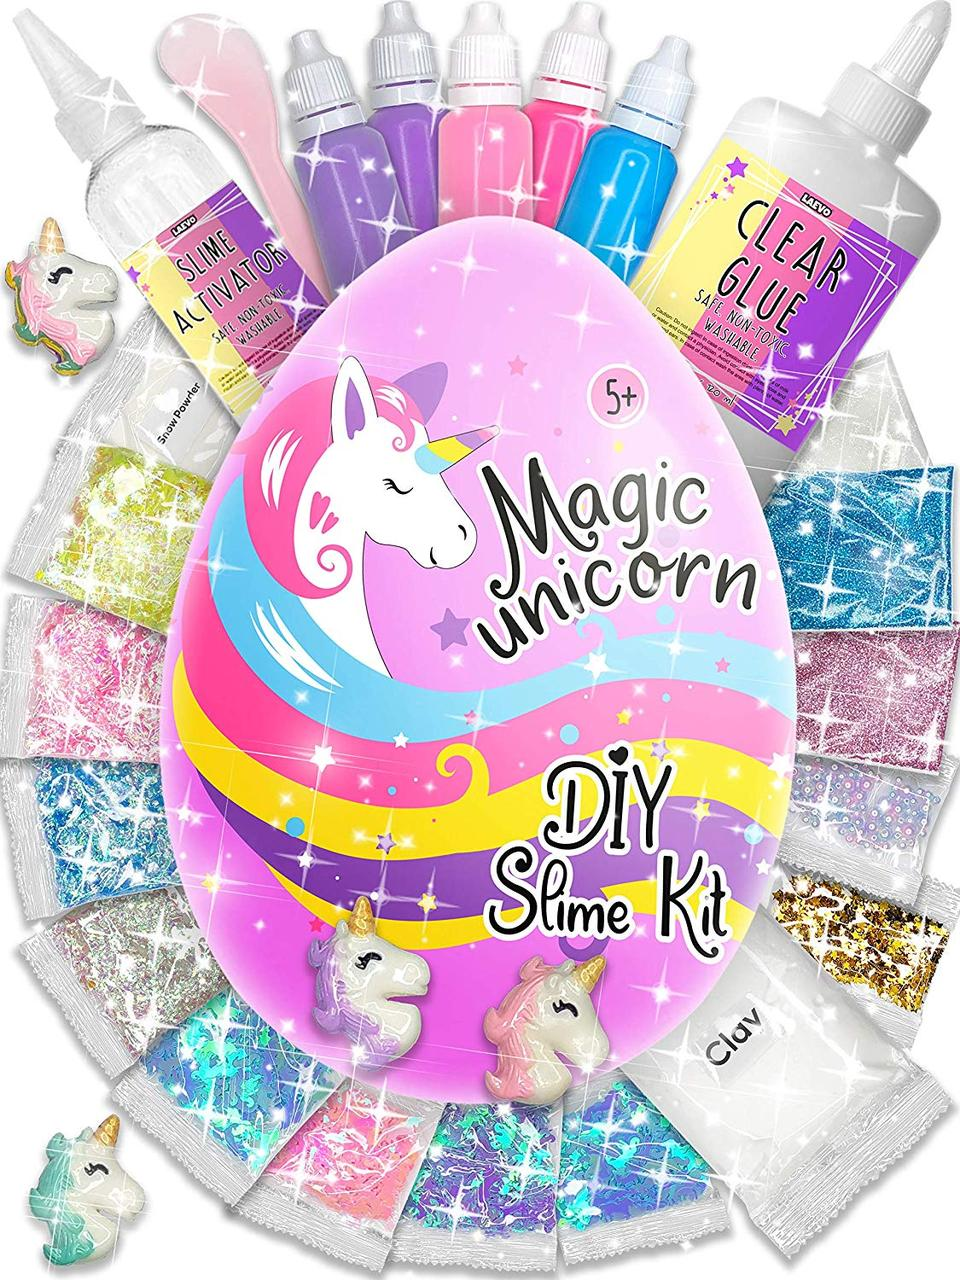 Набор Магическое яйцо Единорога со слаймами 5 секретов. Surprise Unicorn Slime Kit. Оригинал из США